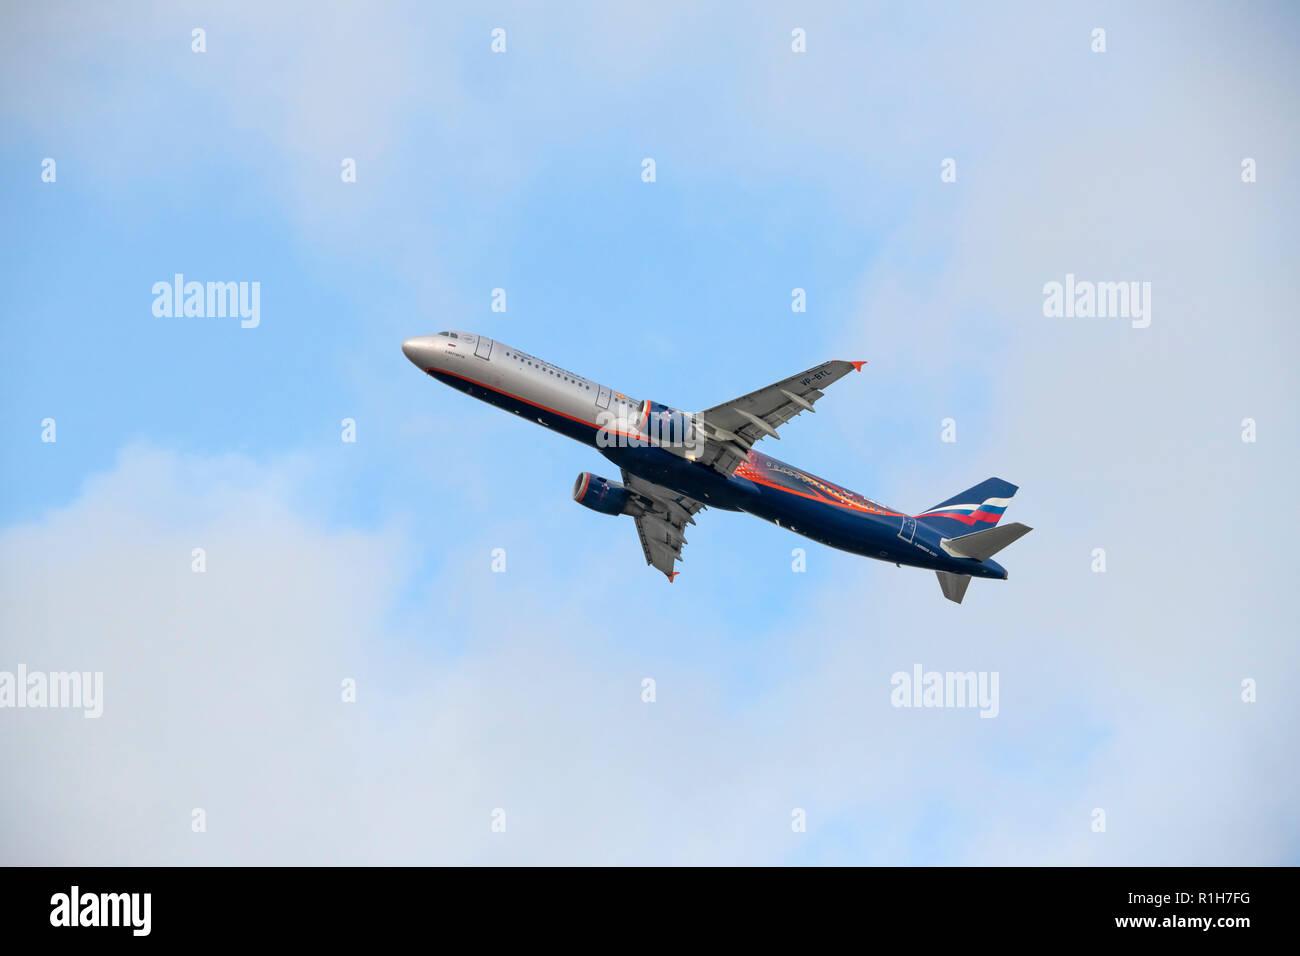 Aeroflot Airbus A321 - Stock Image